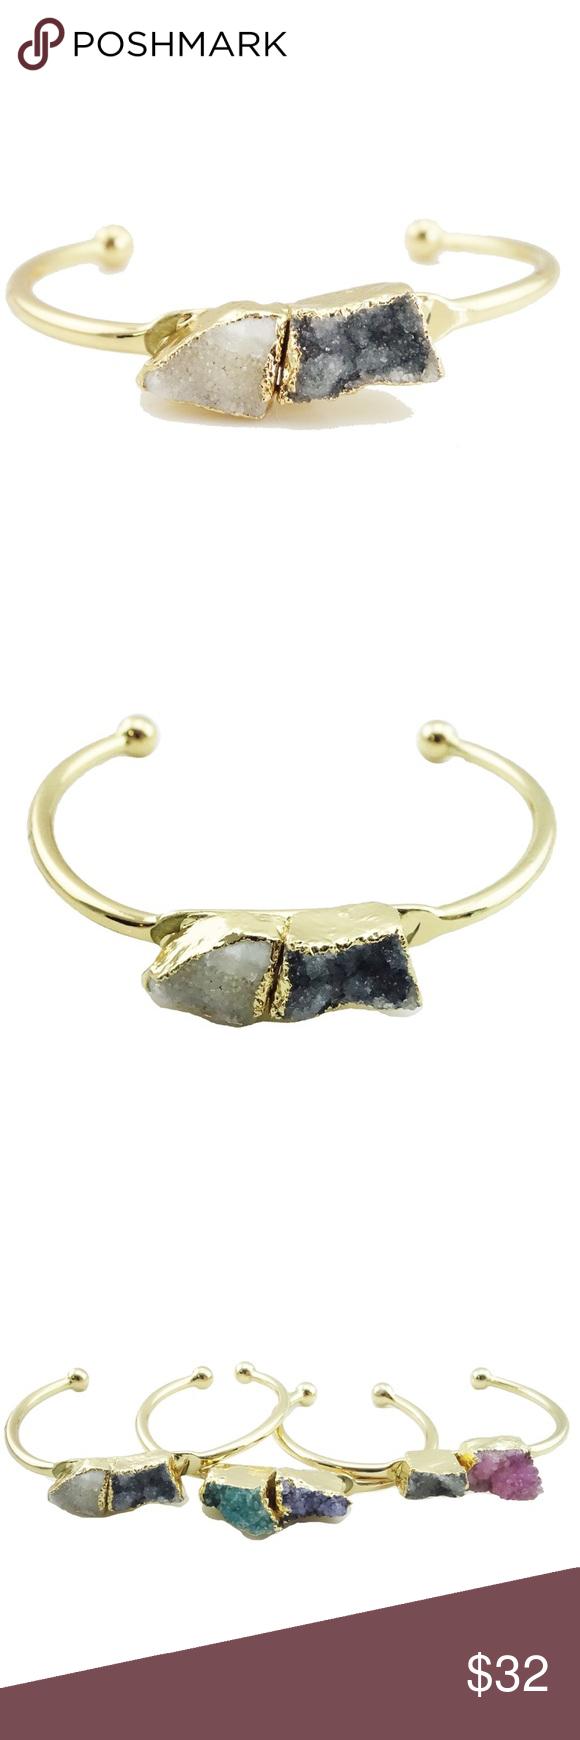 K gold plated druzy cuff bracelet blackwhite boutique my posh